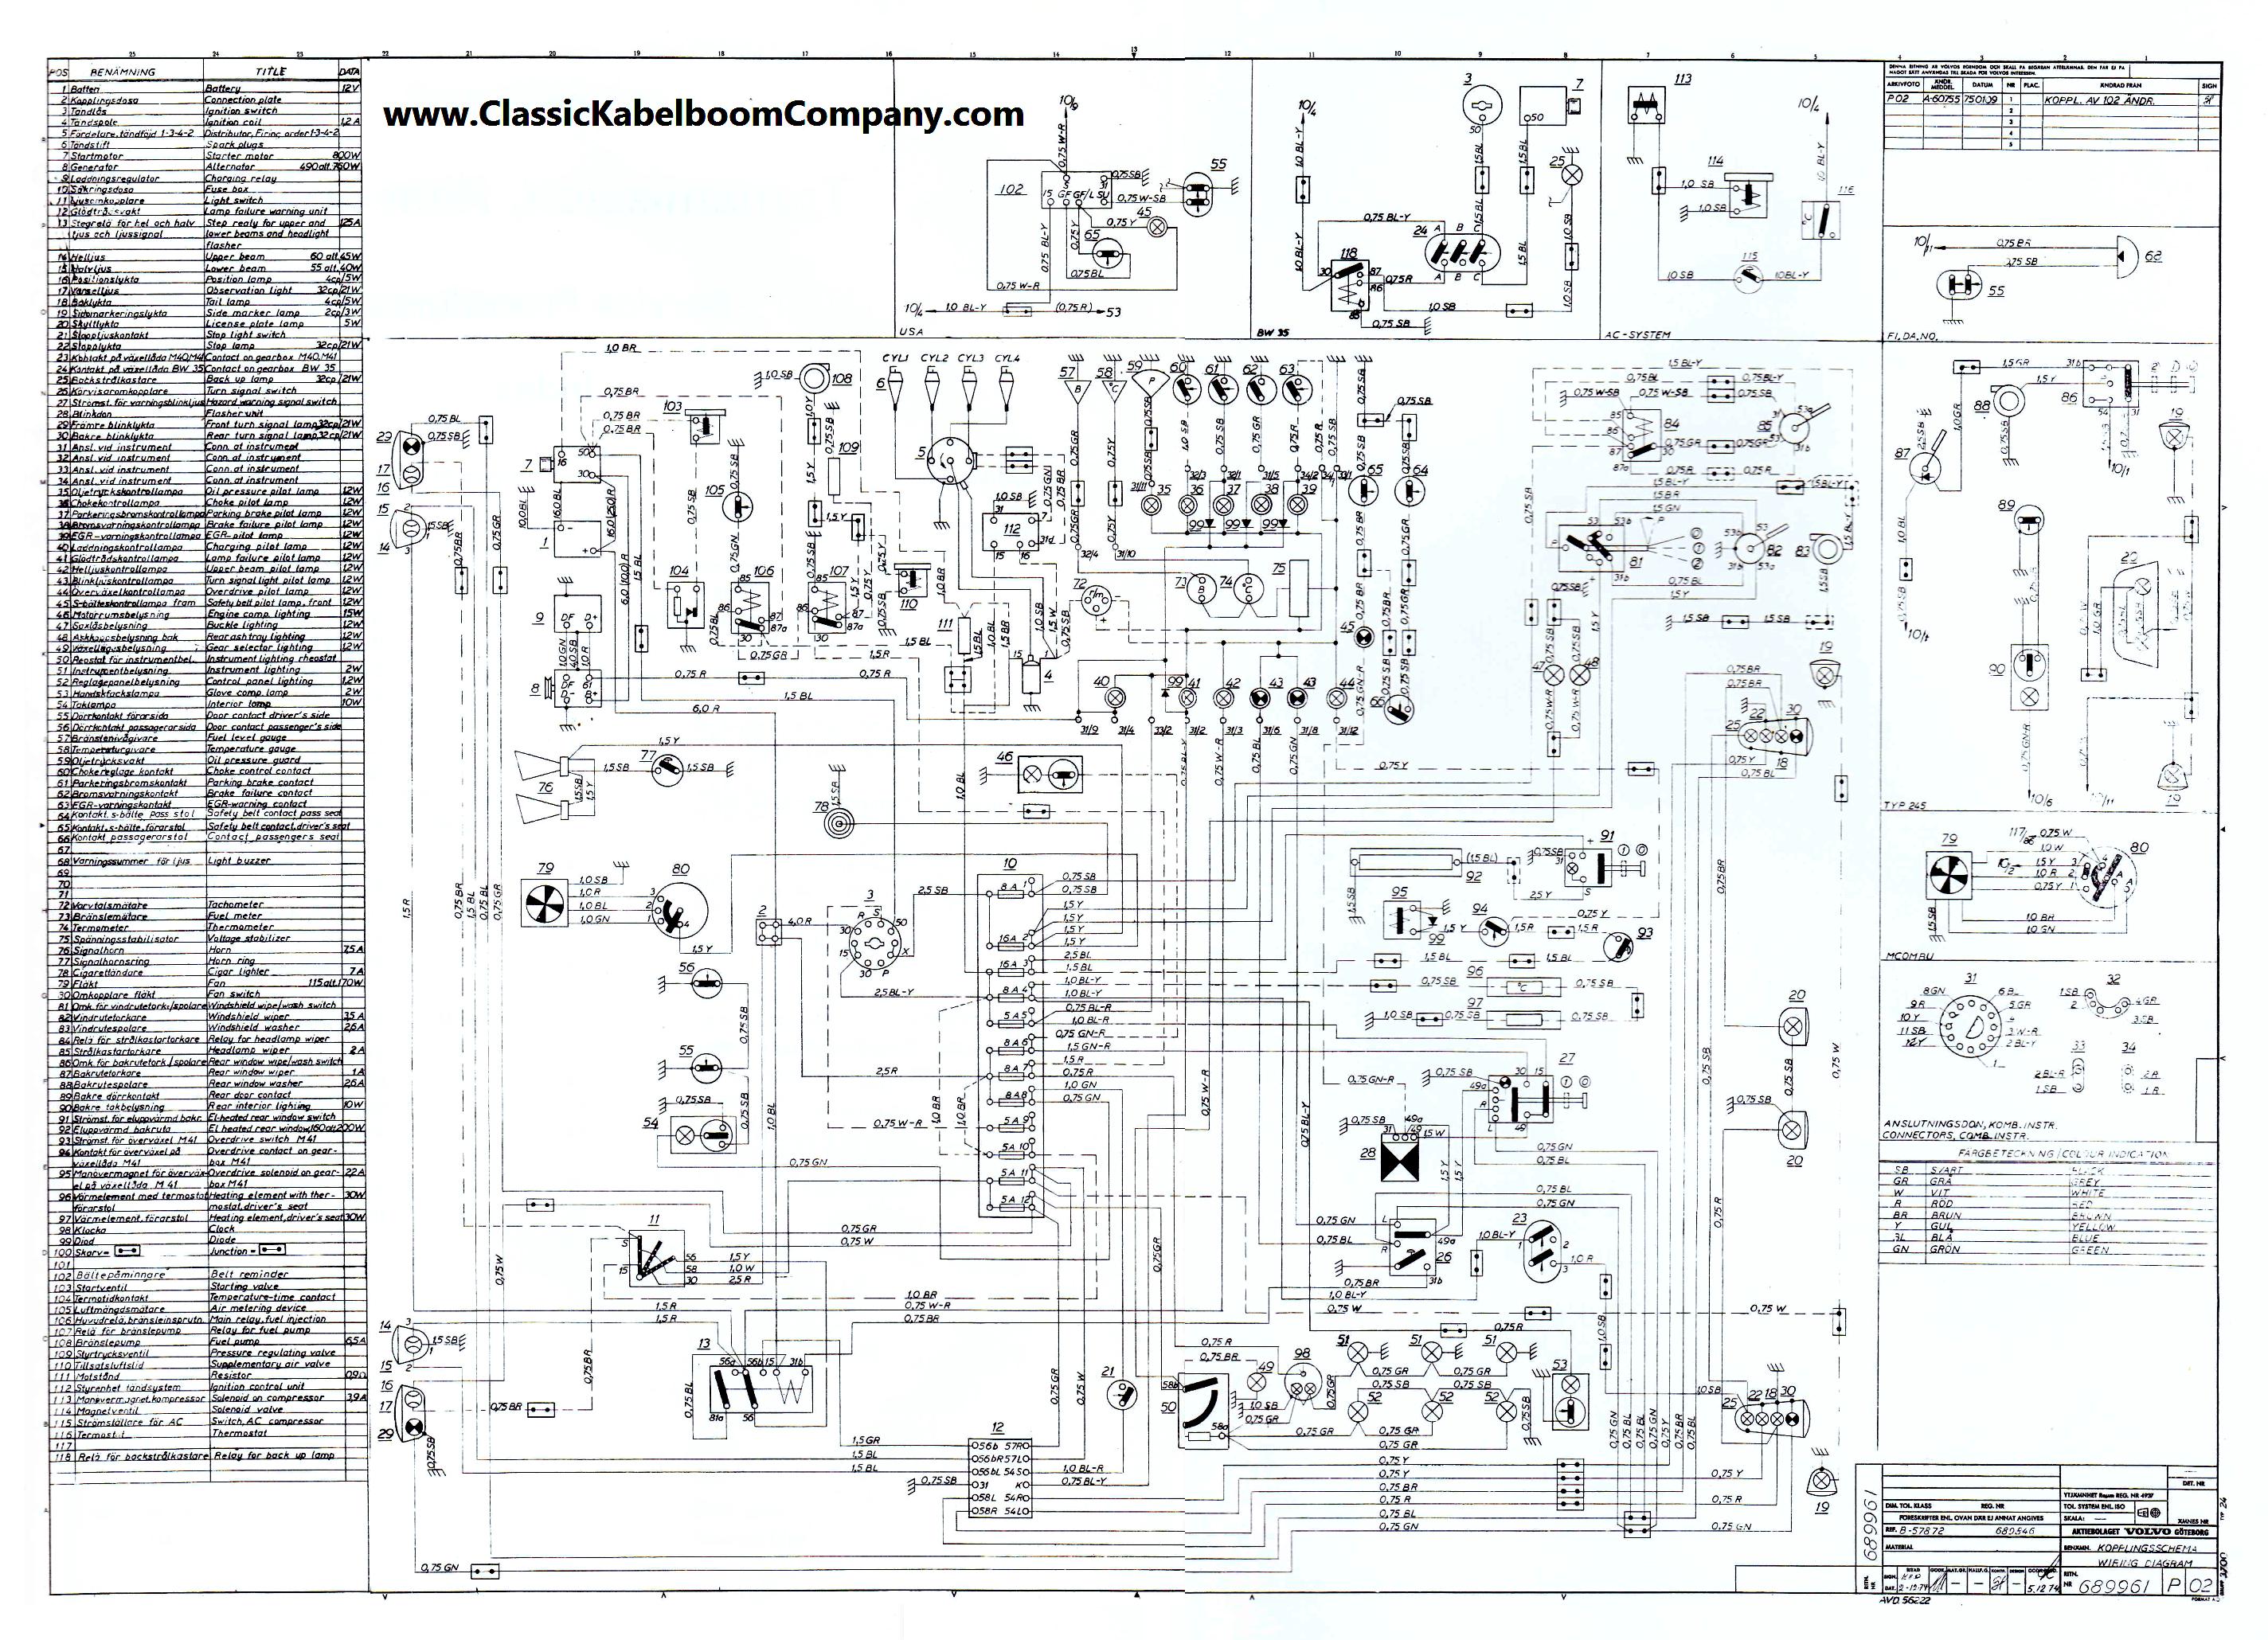 vol40?cdp=a classic kabelboom company elektrisch bedrading schema volvo 1977 Volvo 242 Stance at soozxer.org